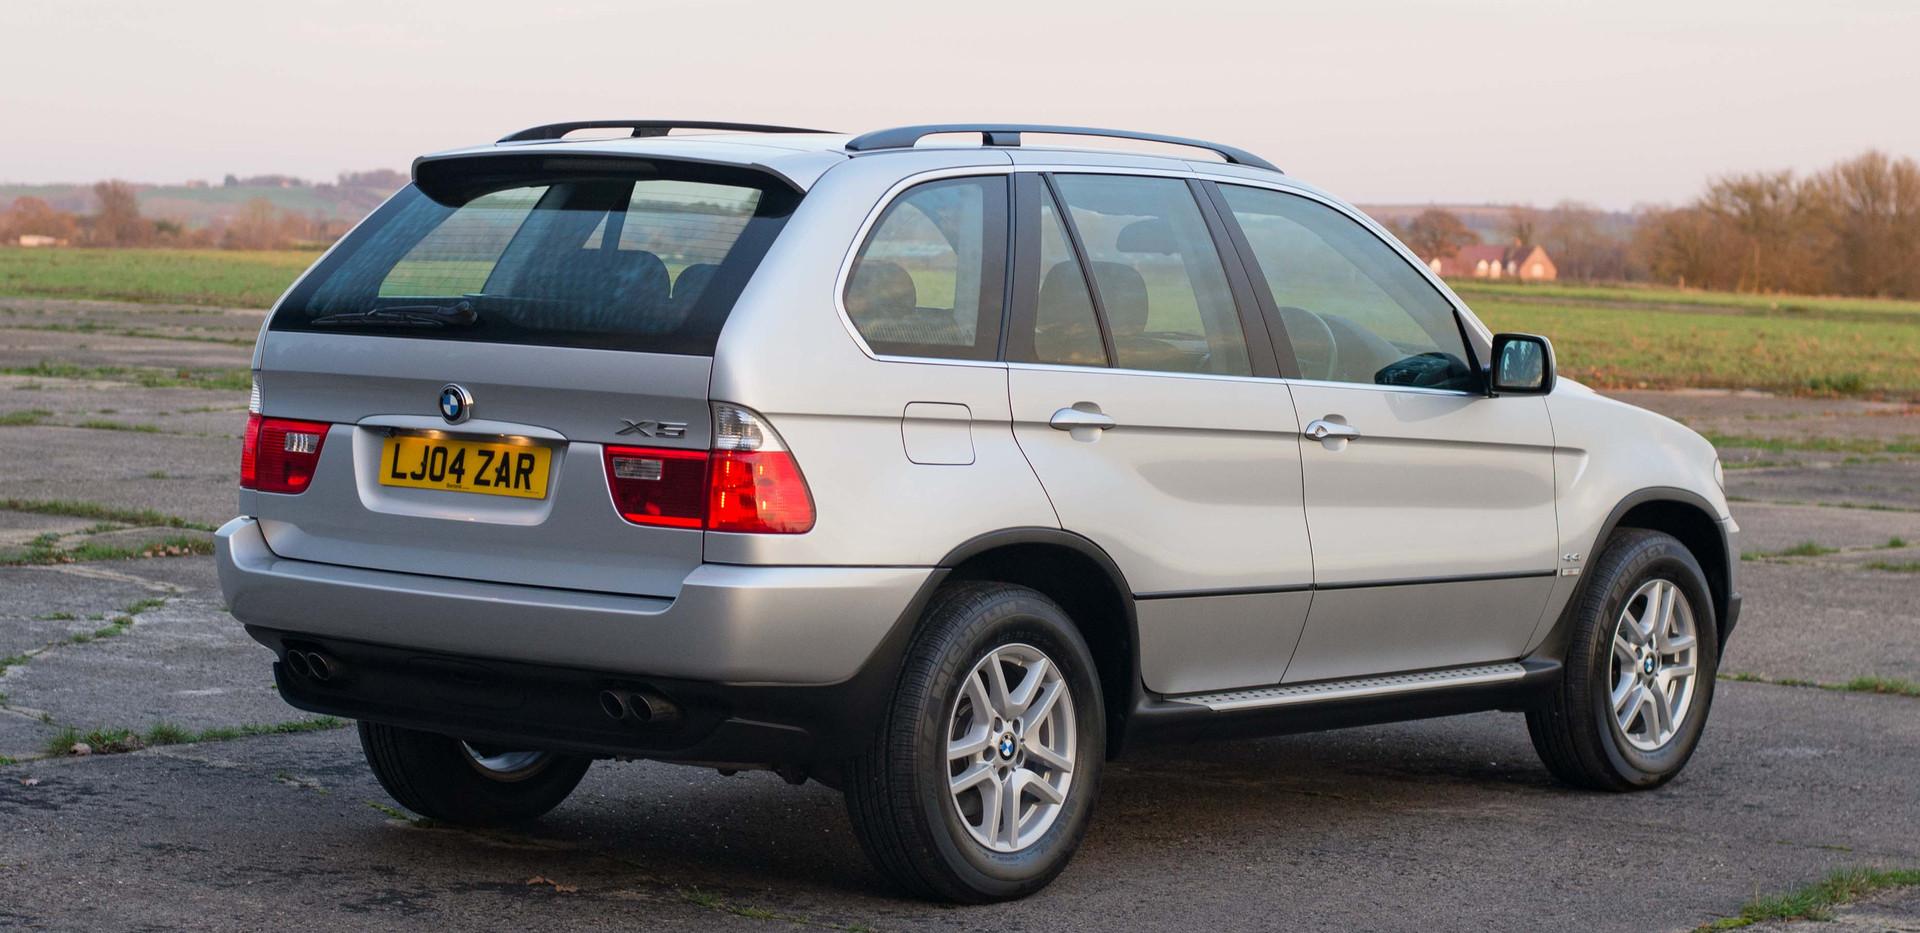 BMW E53 X5 4.4i For Sale UK London  (36